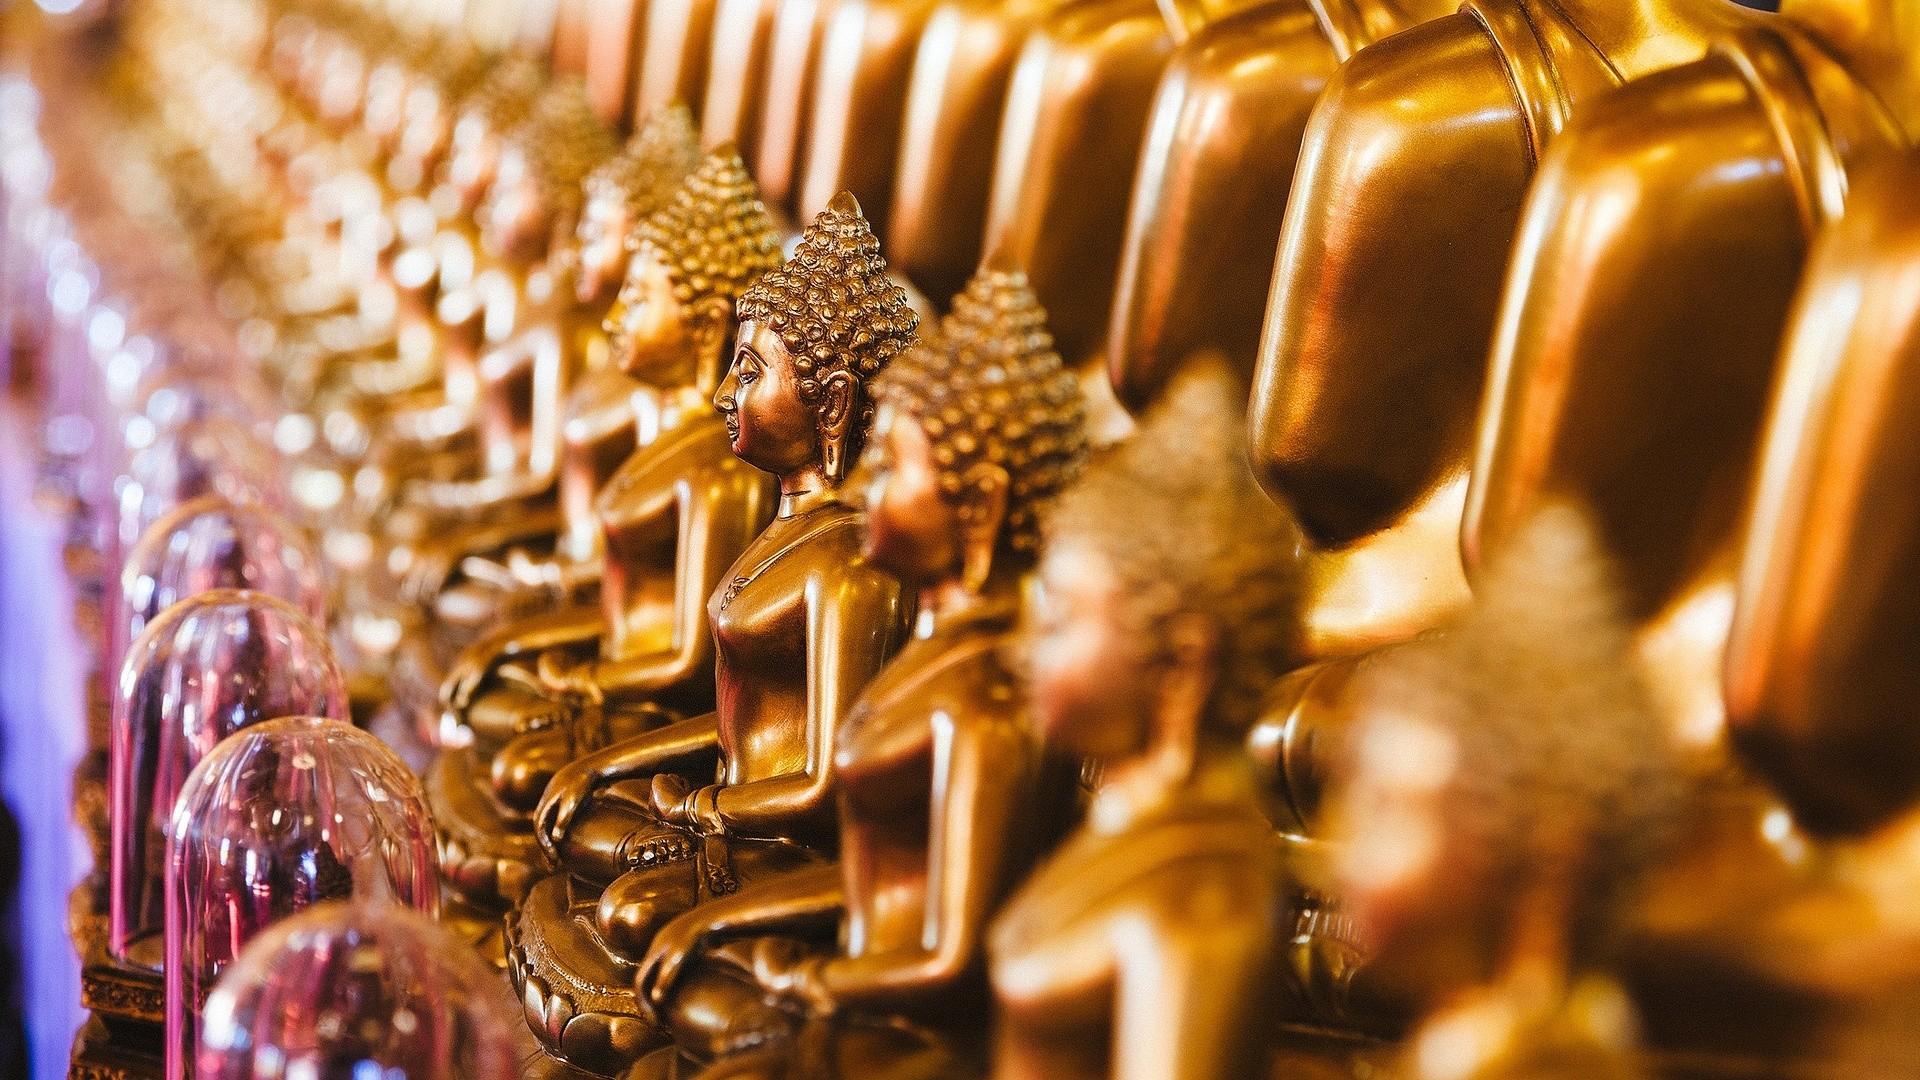 Golden Idols Lord Buddha